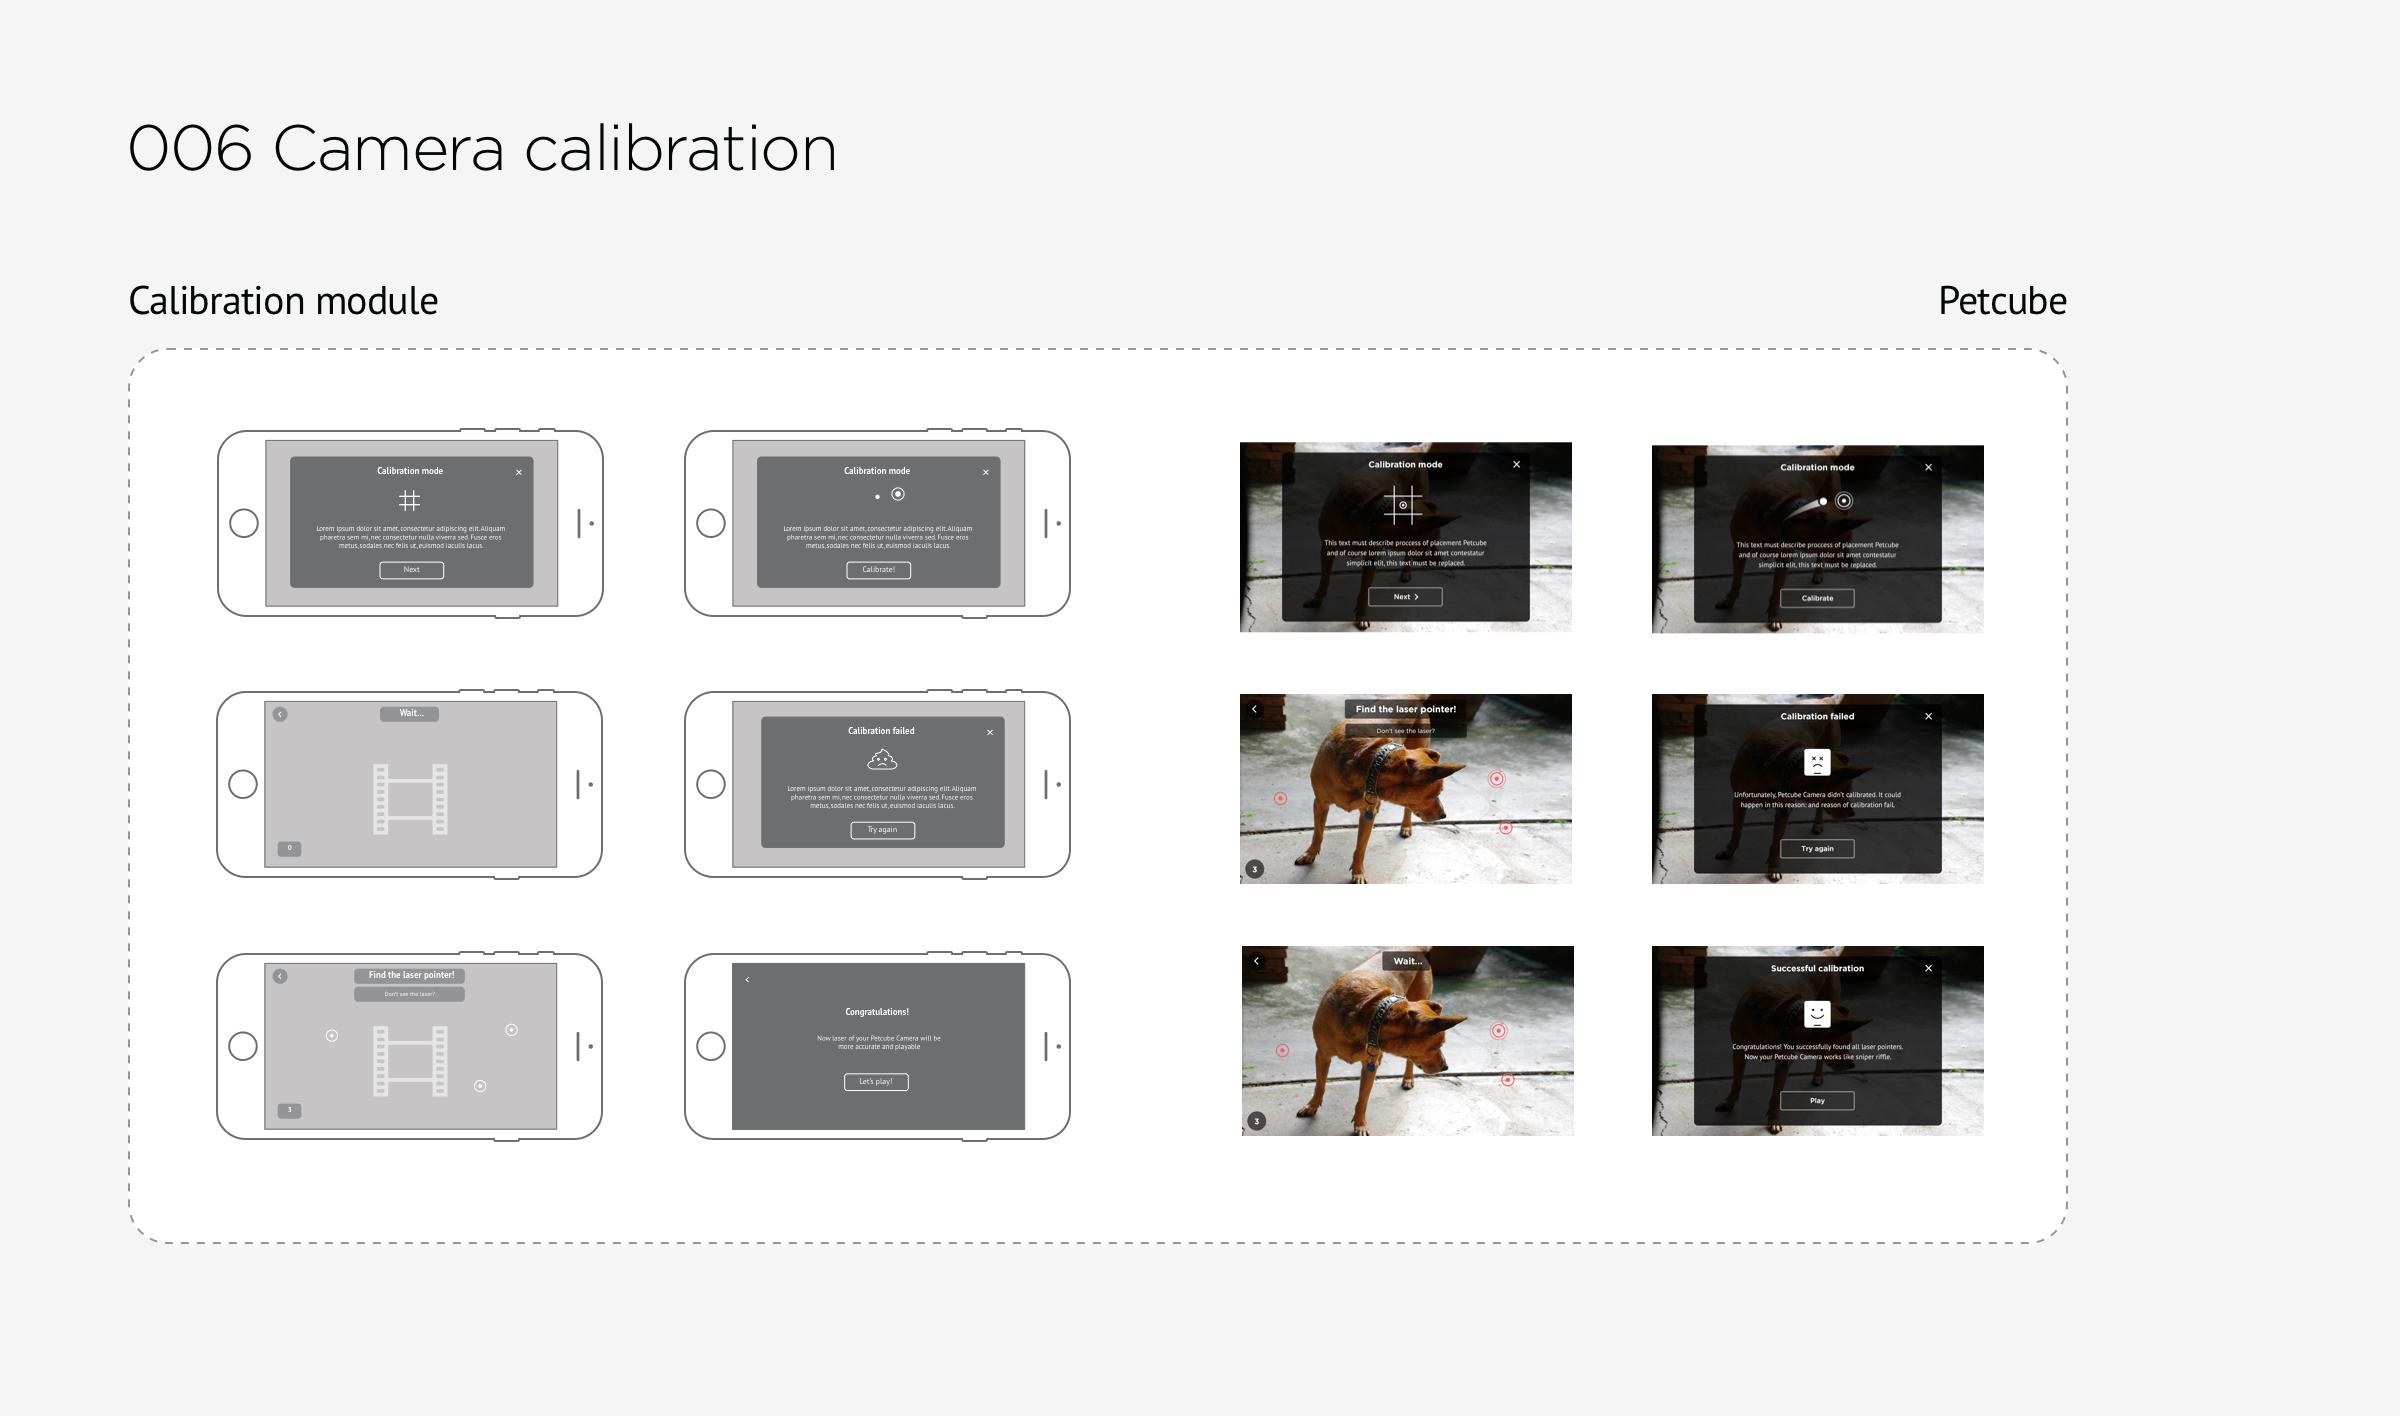 camera_calibration@2x